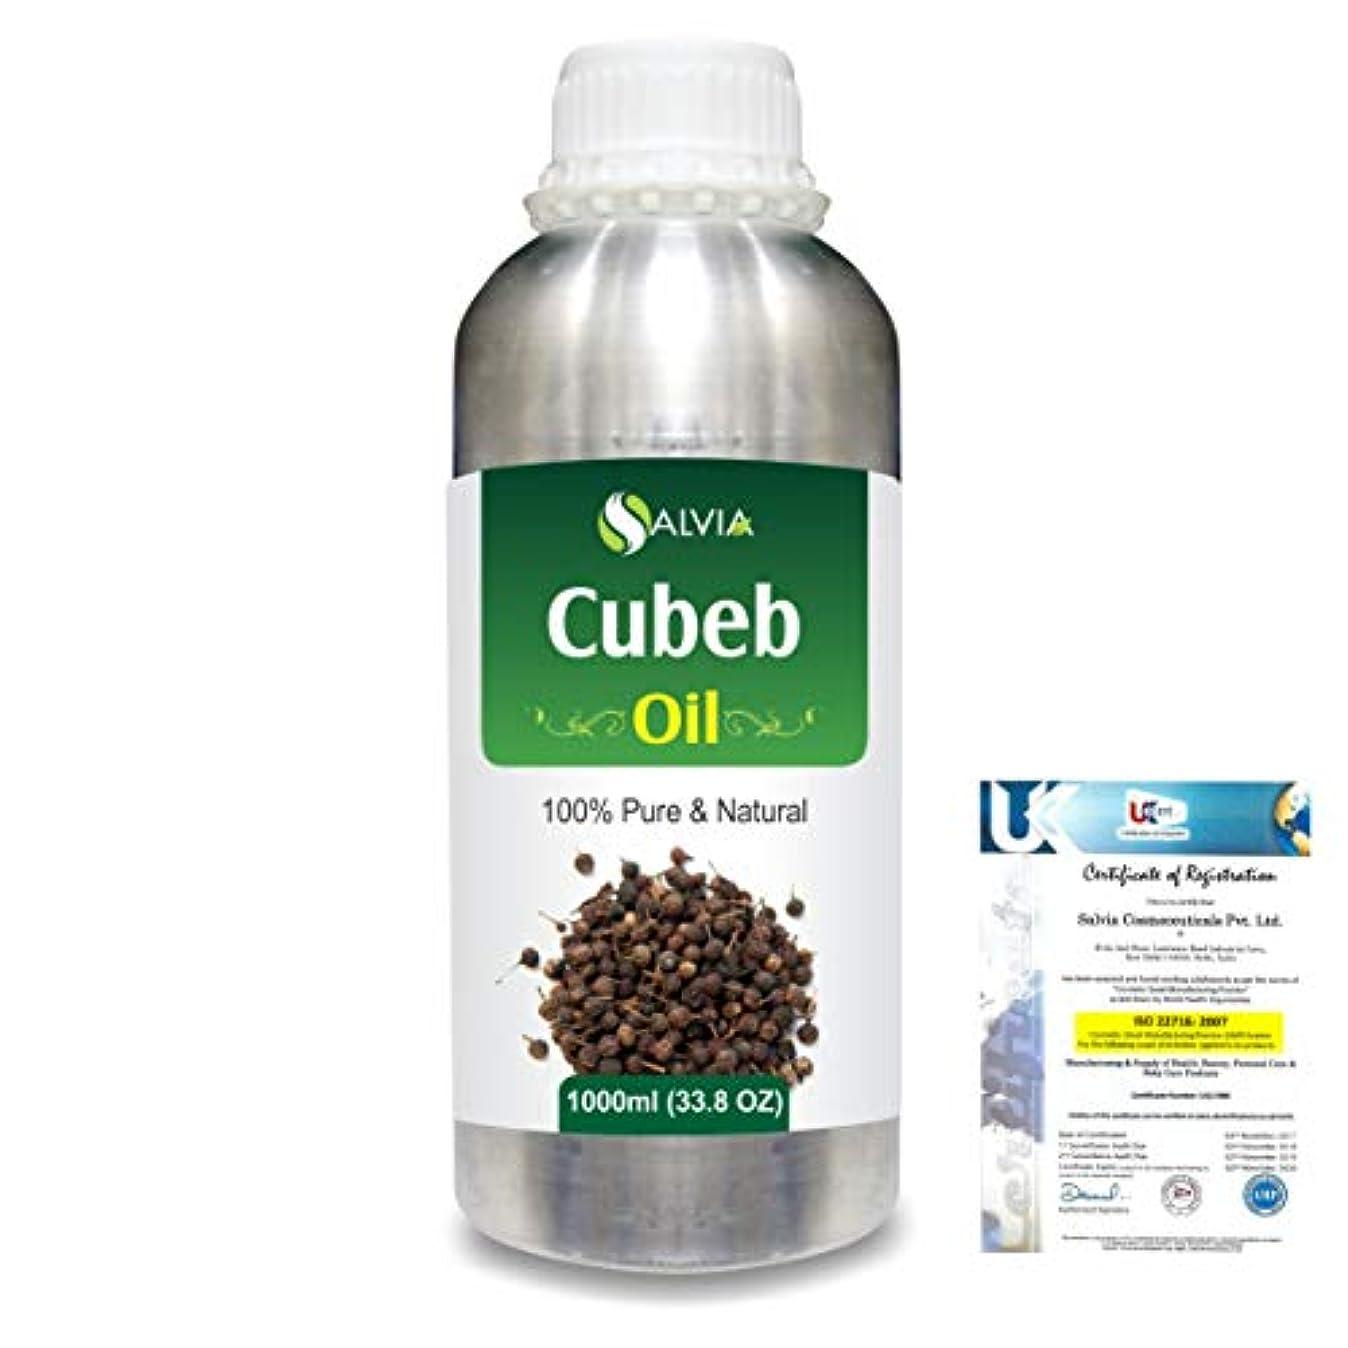 Cubeb (Piper Cubeba) 100% Pure Natural Essential Oil 1000ml/33.8fl.oz.